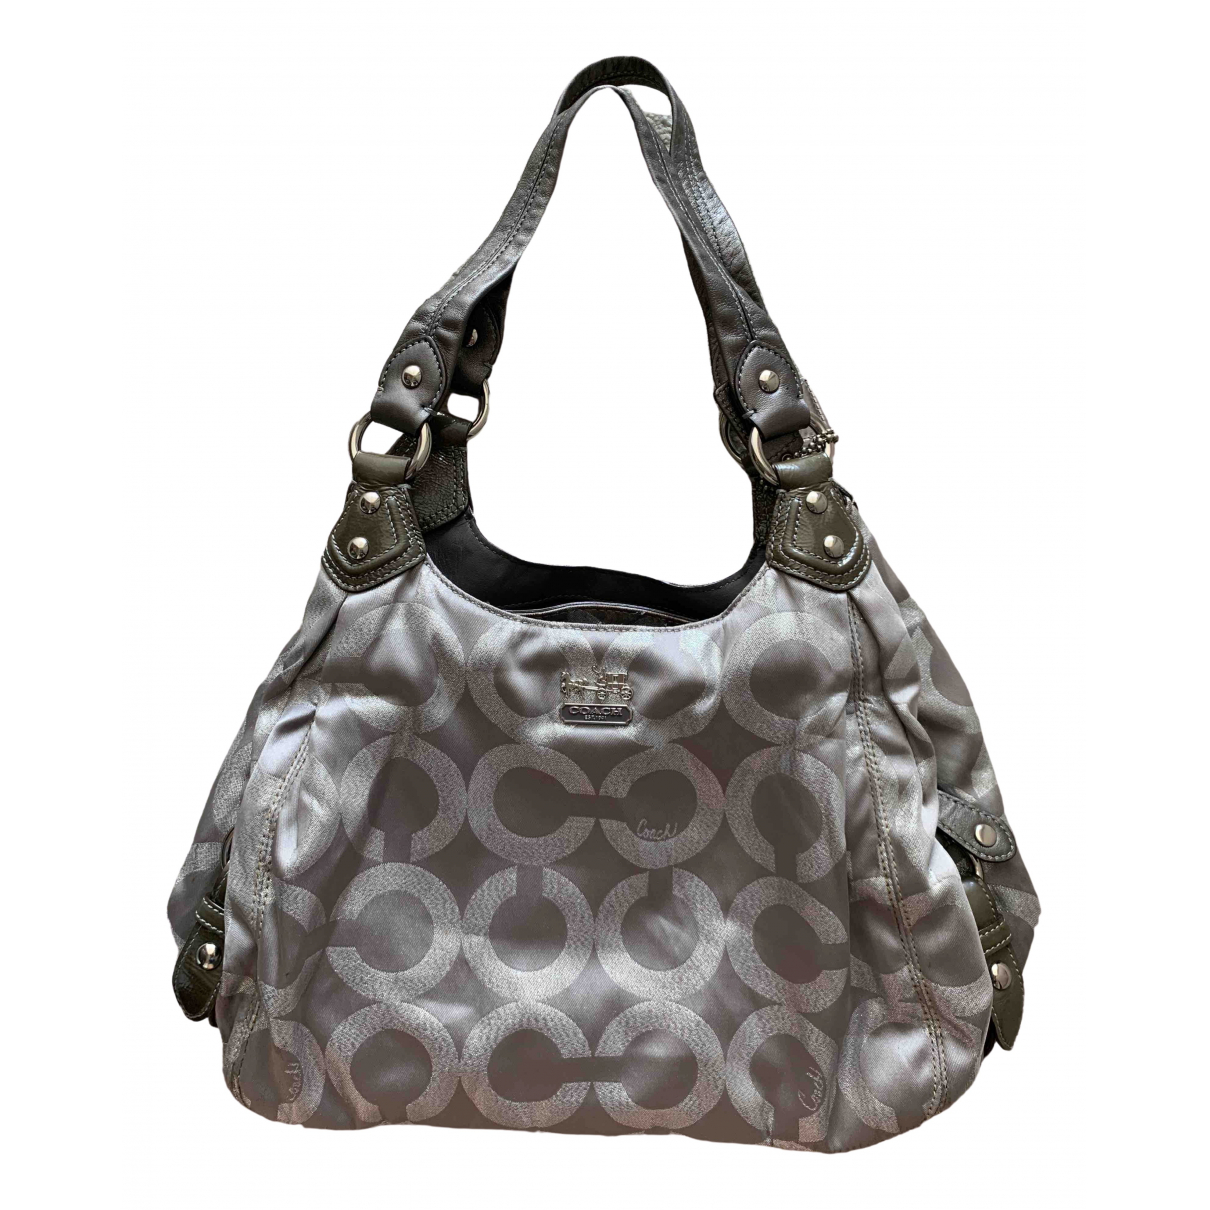 Coach Edie Metallic handbag for Women N